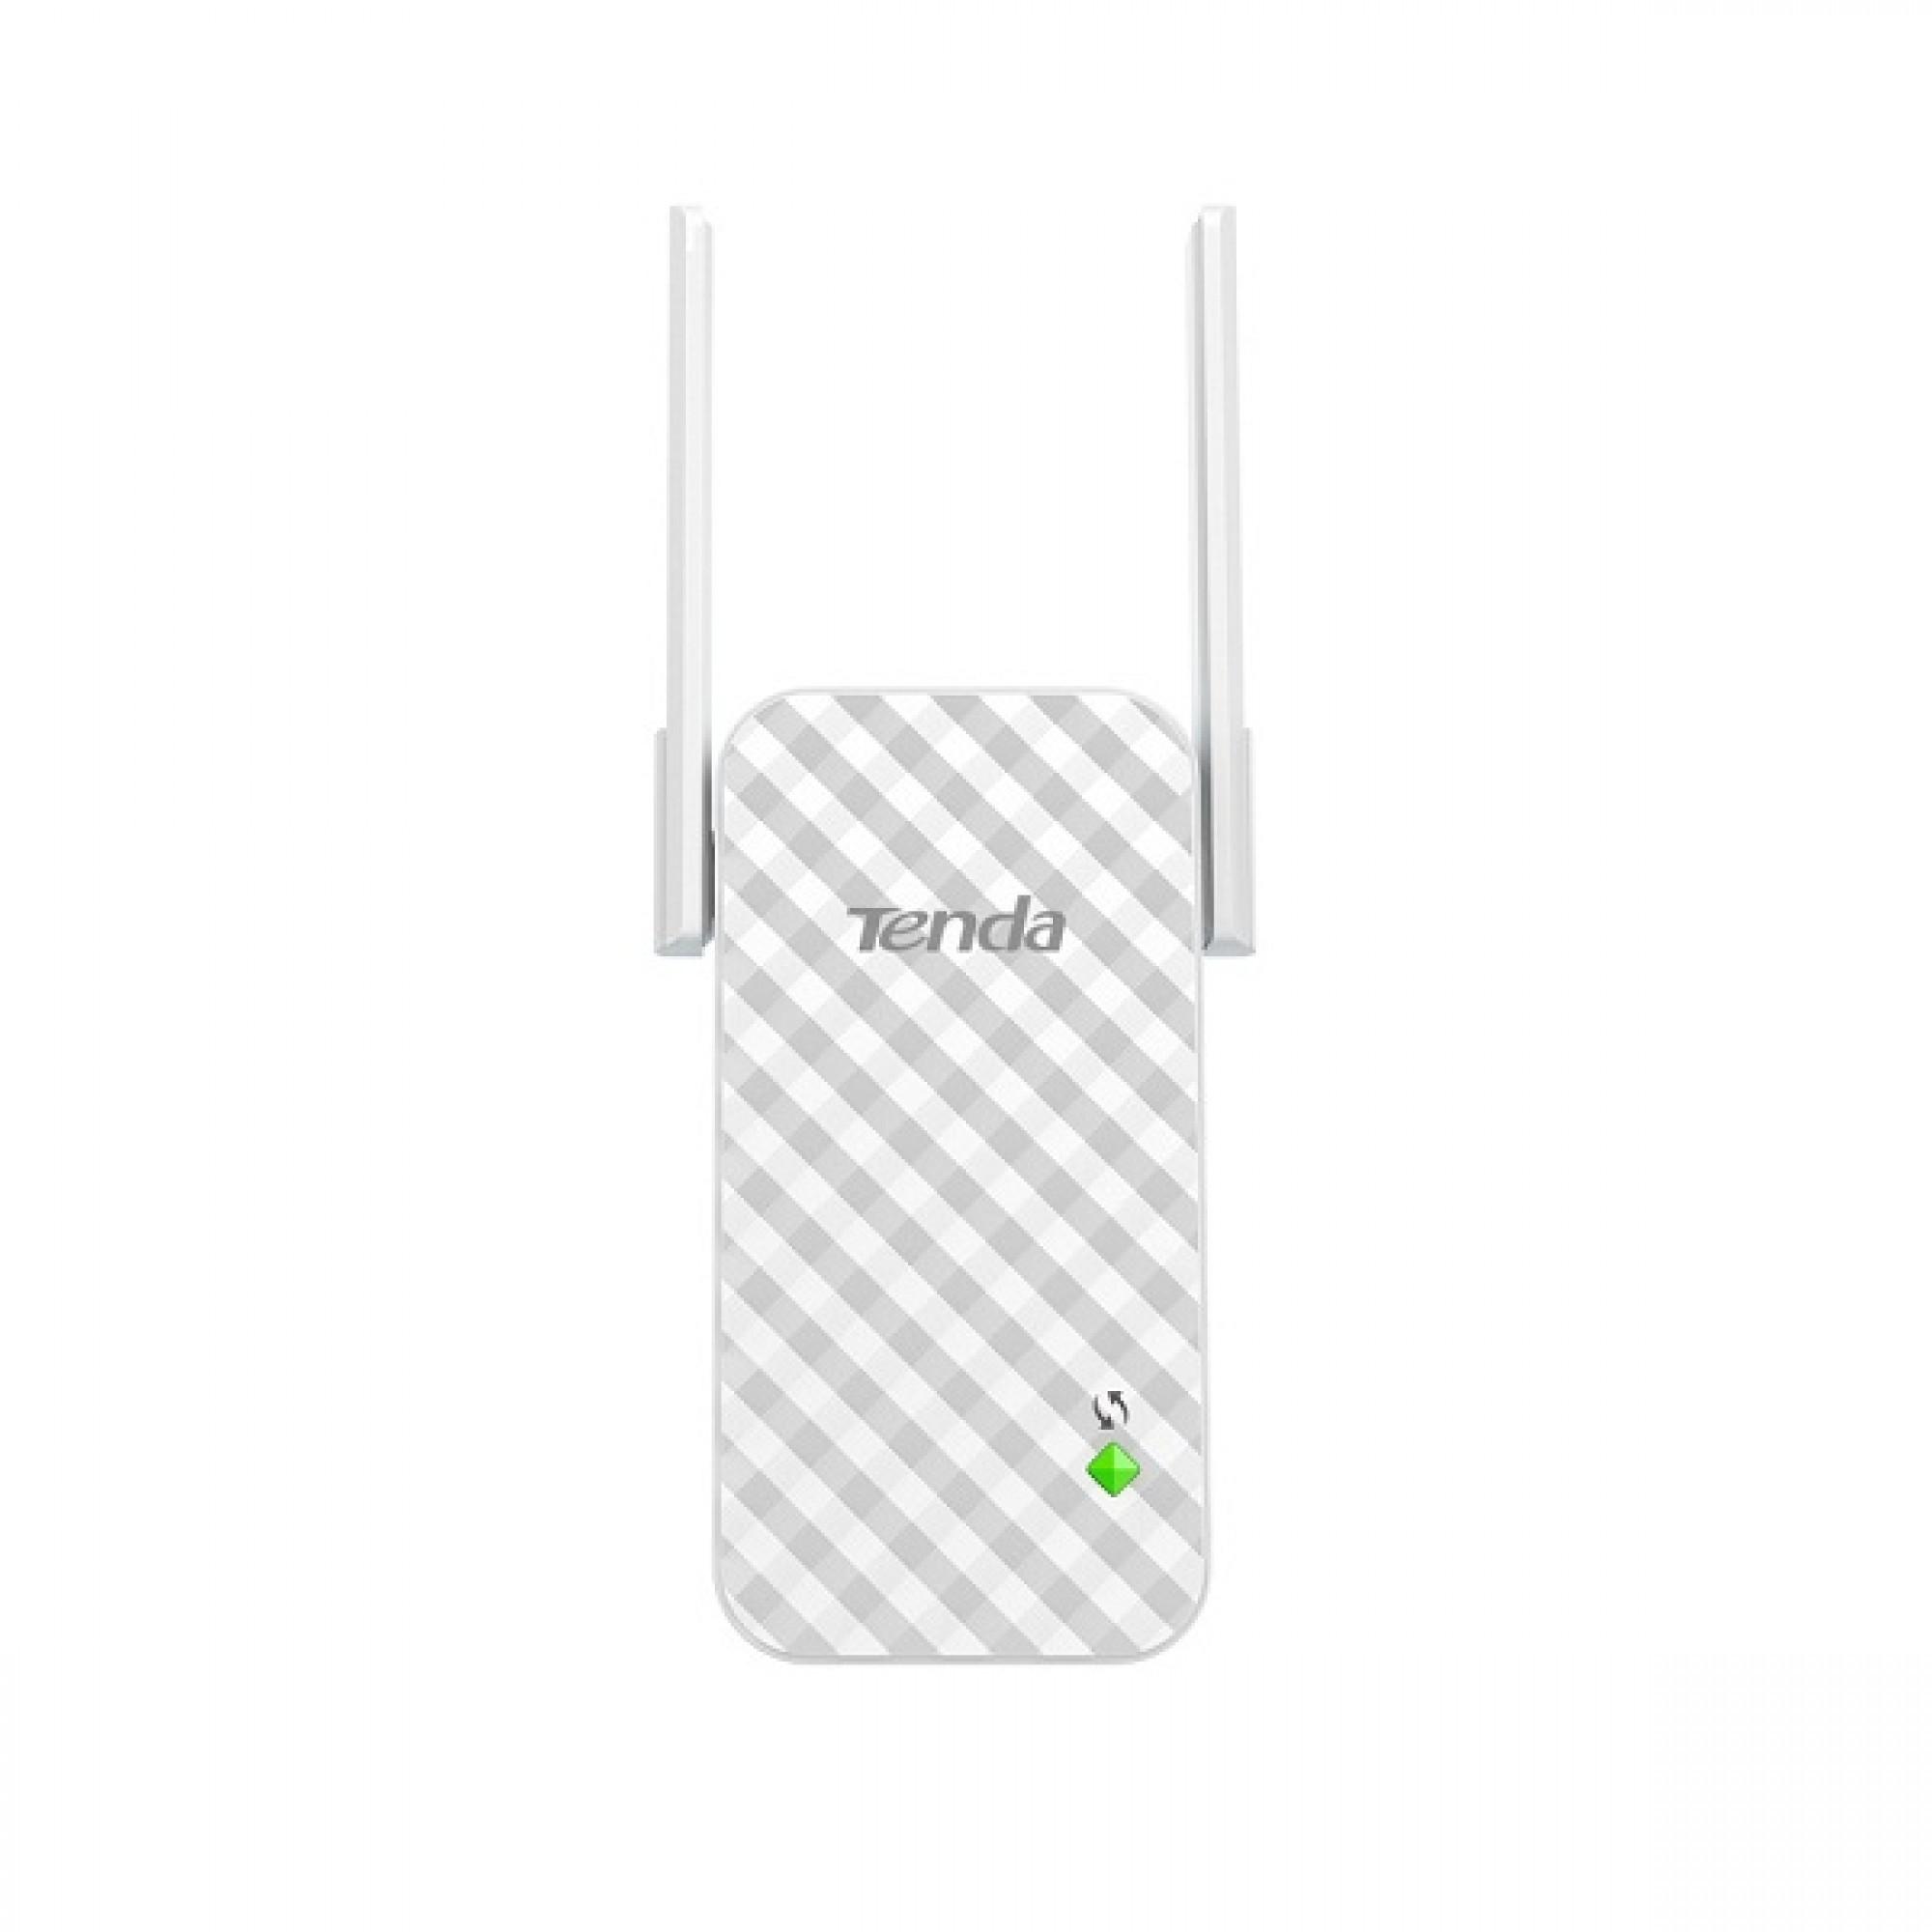 Repetidor Universal Wireless Tenda N300 A9 300Mbps  - CFTV Clube | Brasil